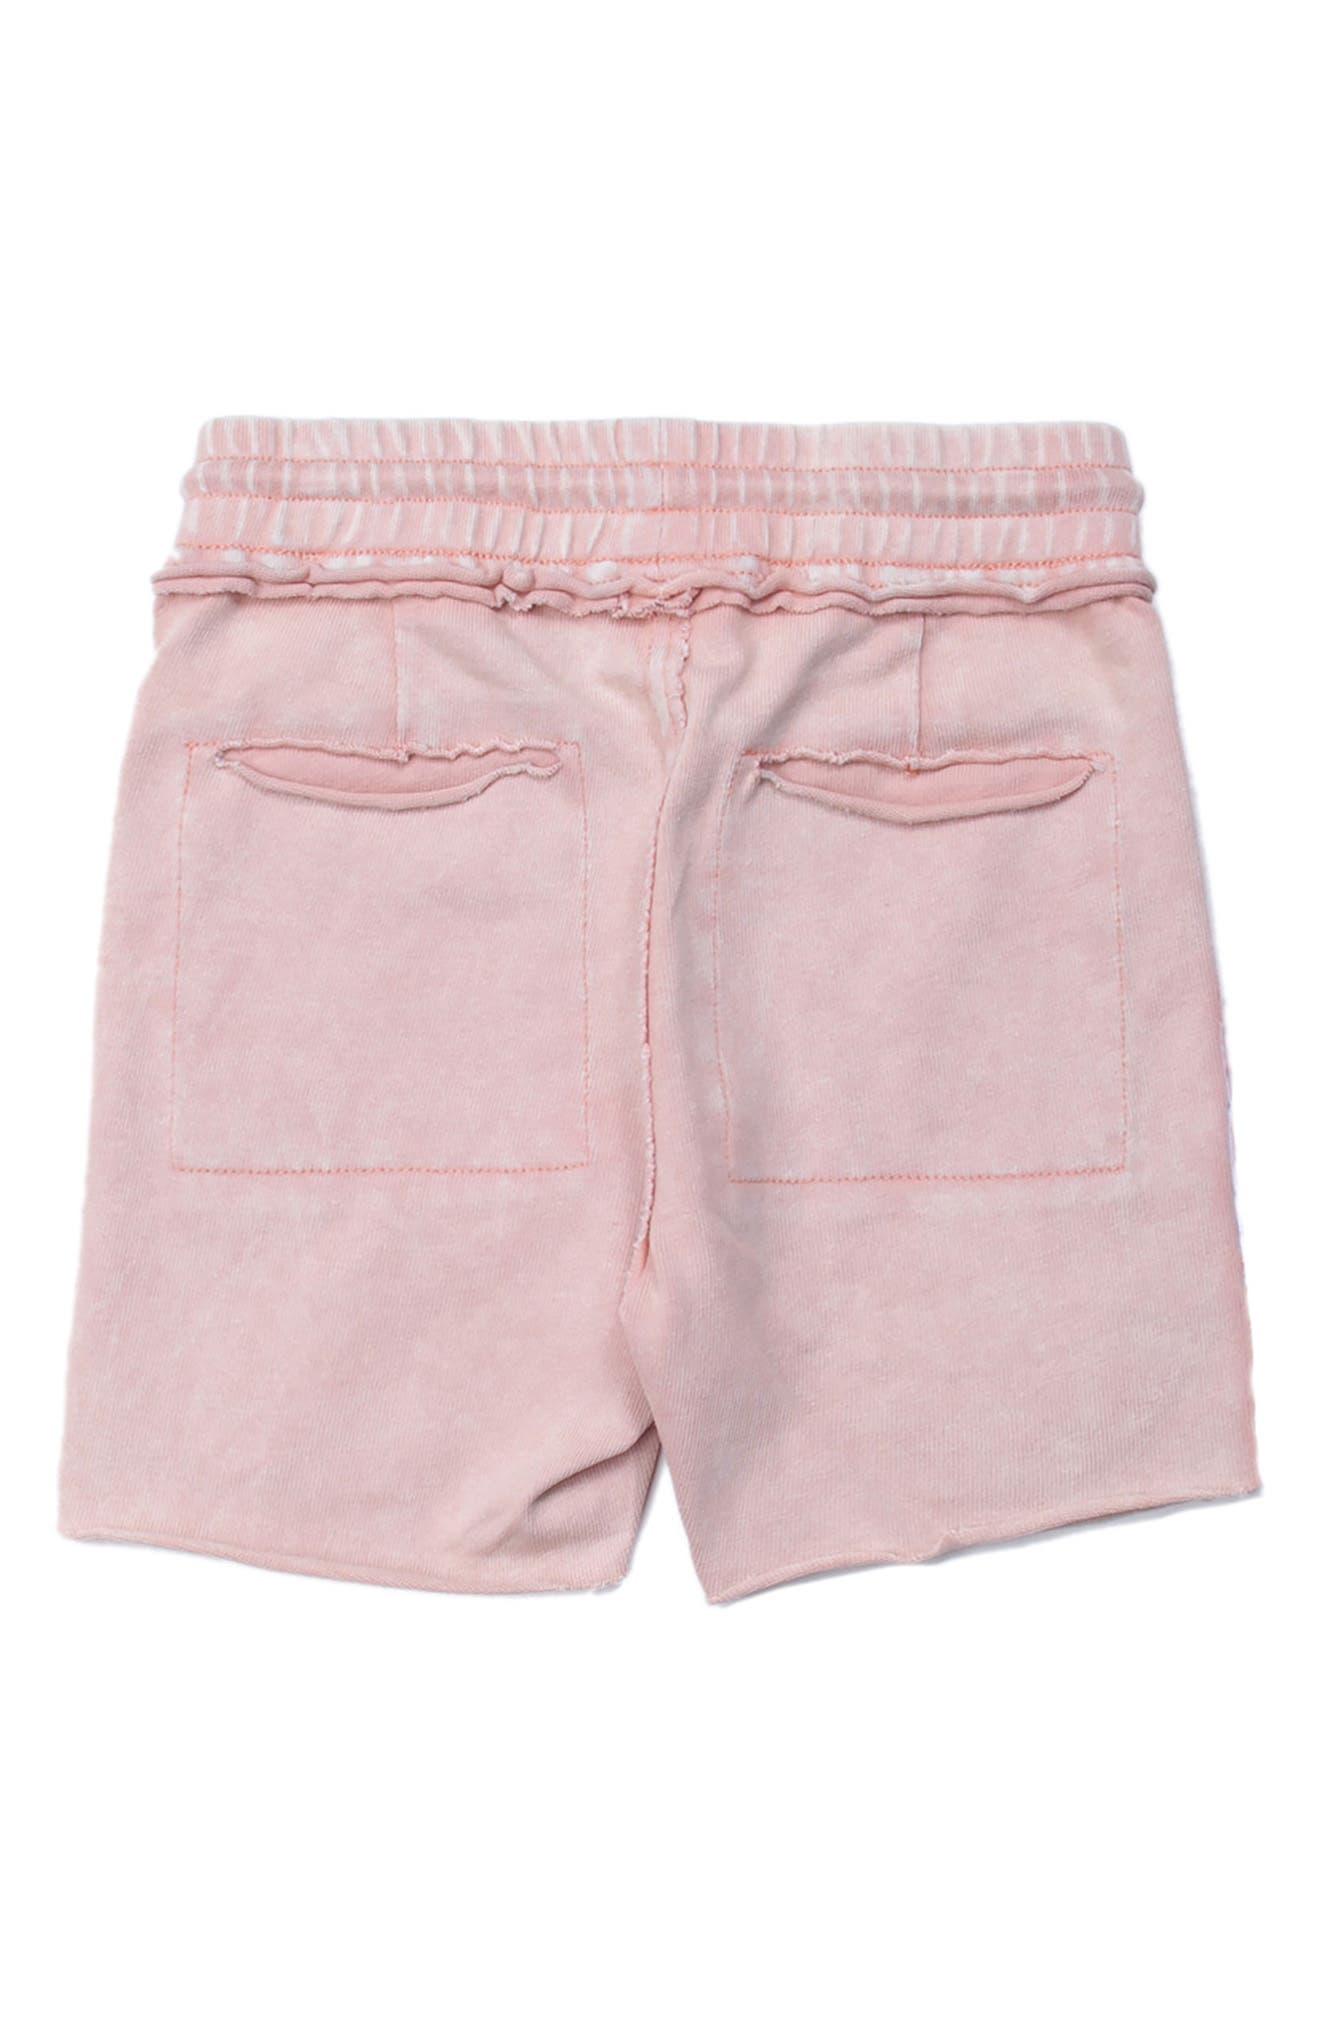 Kirk Distressed Shorts,                             Alternate thumbnail 2, color,                             Pink